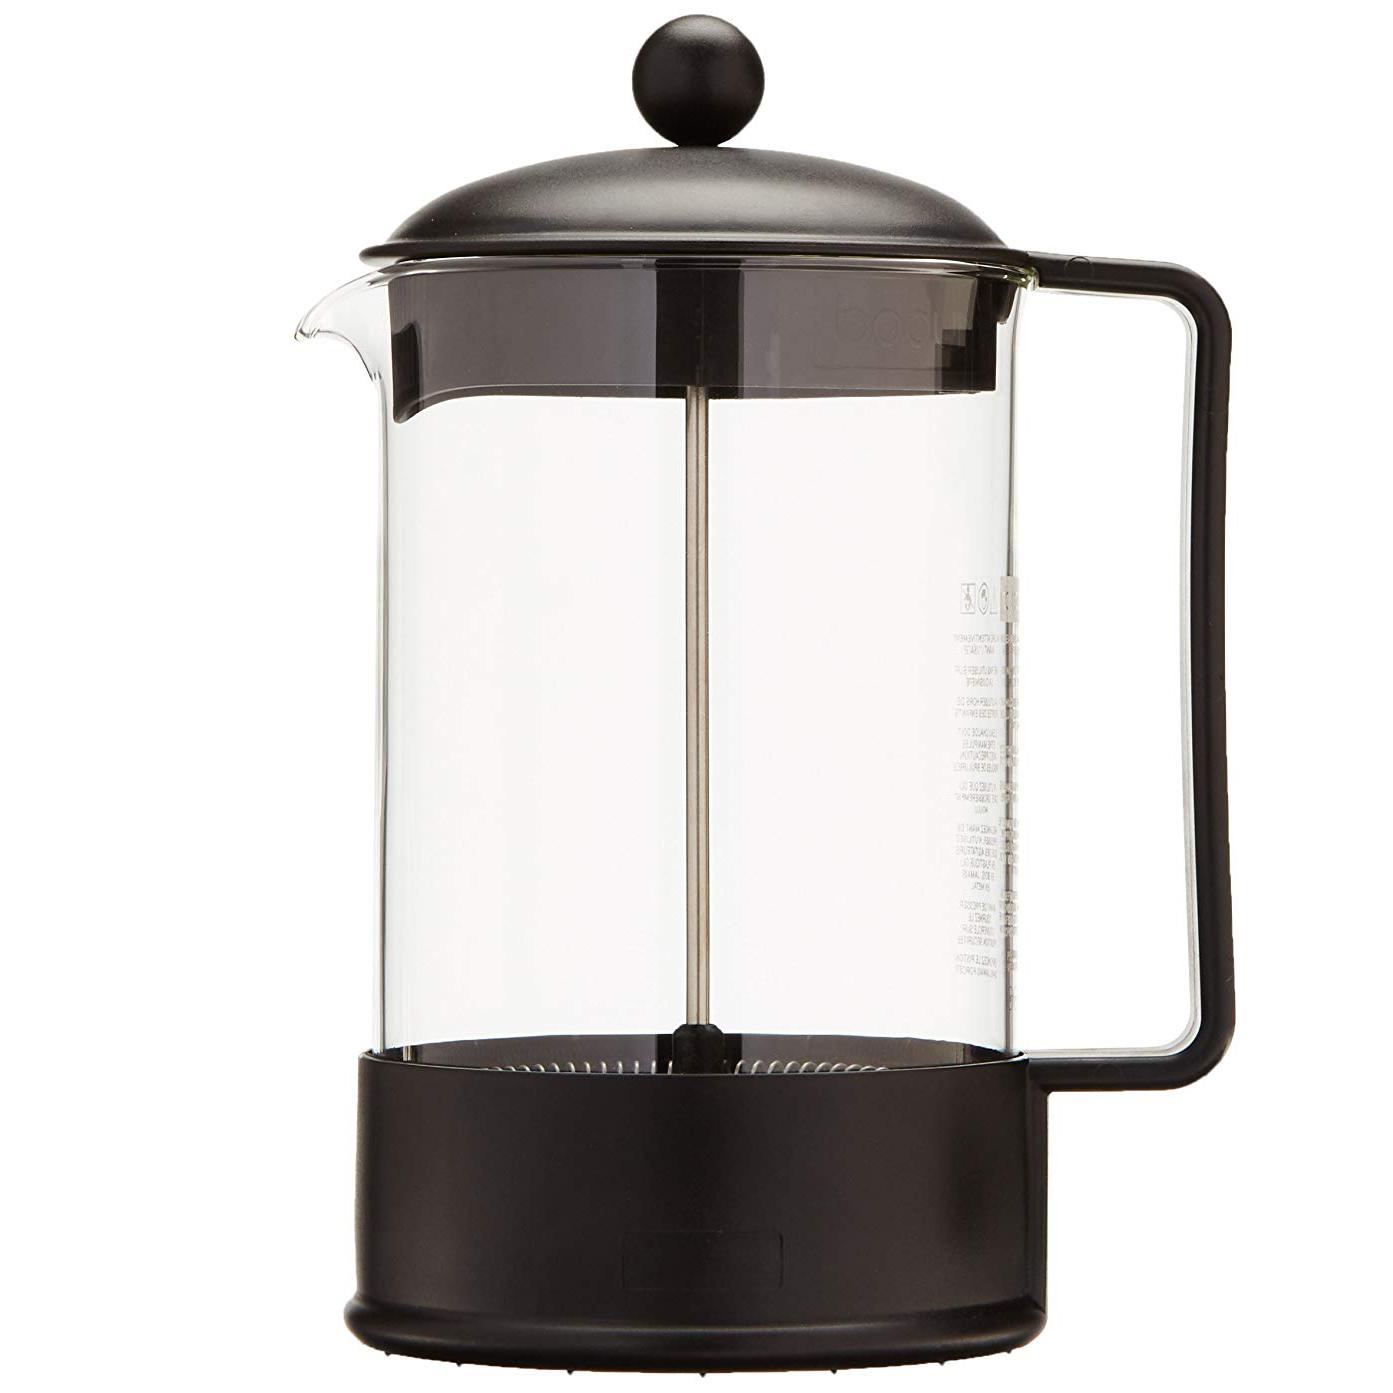 Bodum Brazil 12 Cup French Press Coffee Maker 1.5L 51oz